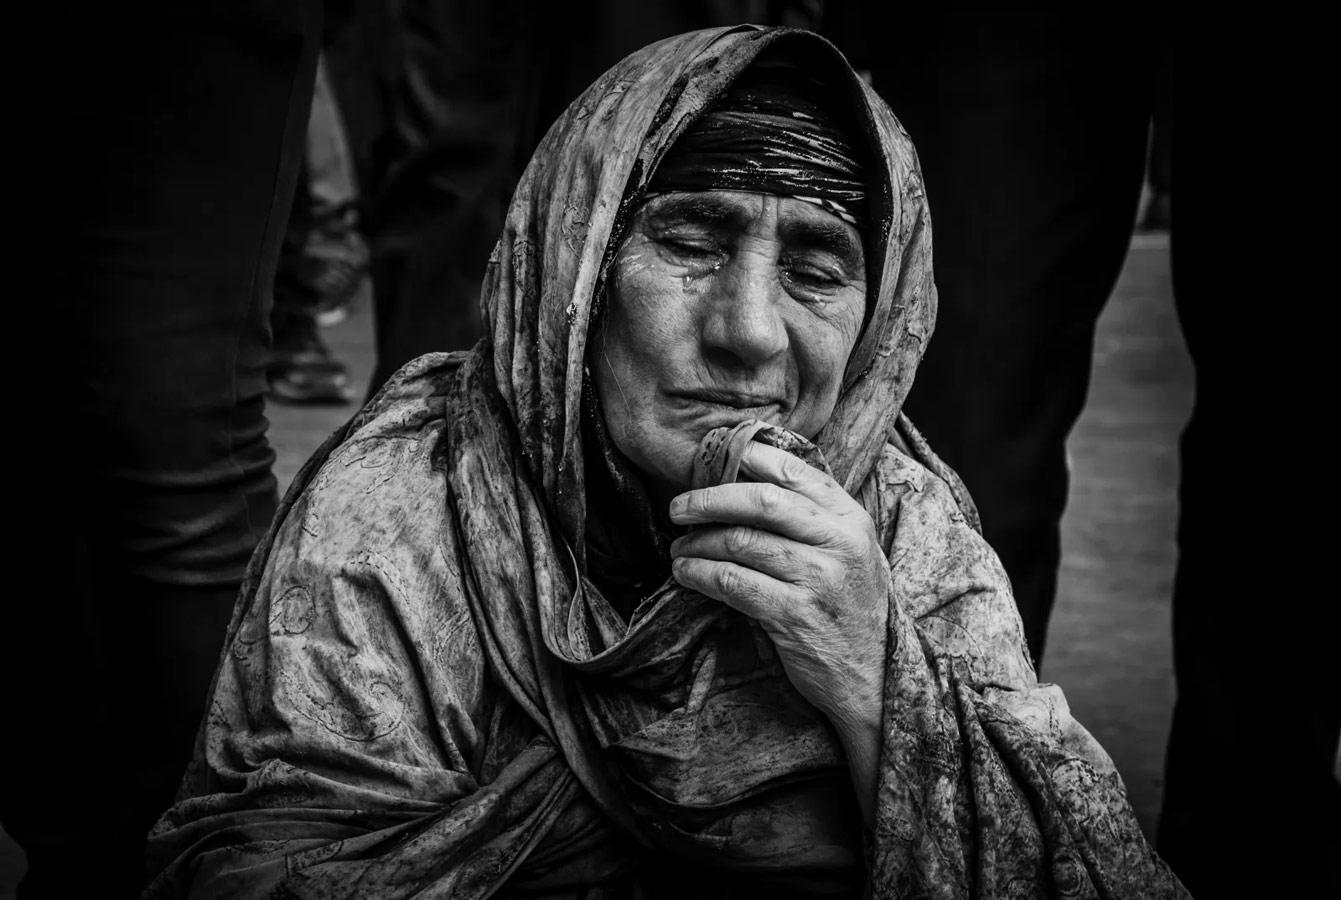 Tears in Her Eyes..., © Sadegh Amiri Hanzaki, Global Grand Prize Winner, Metro Photo Challenge